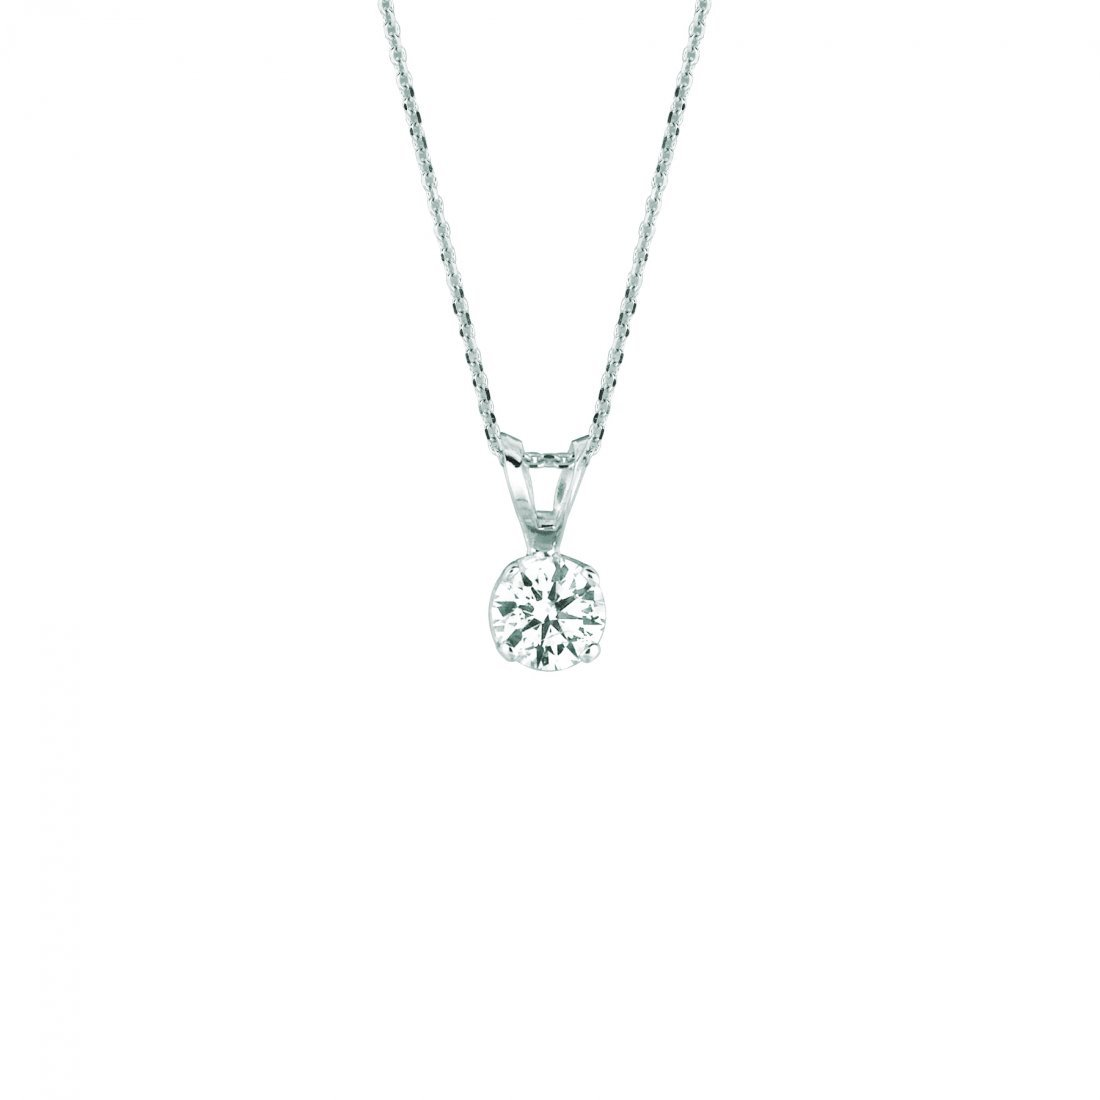 15 pointer diamond necklace